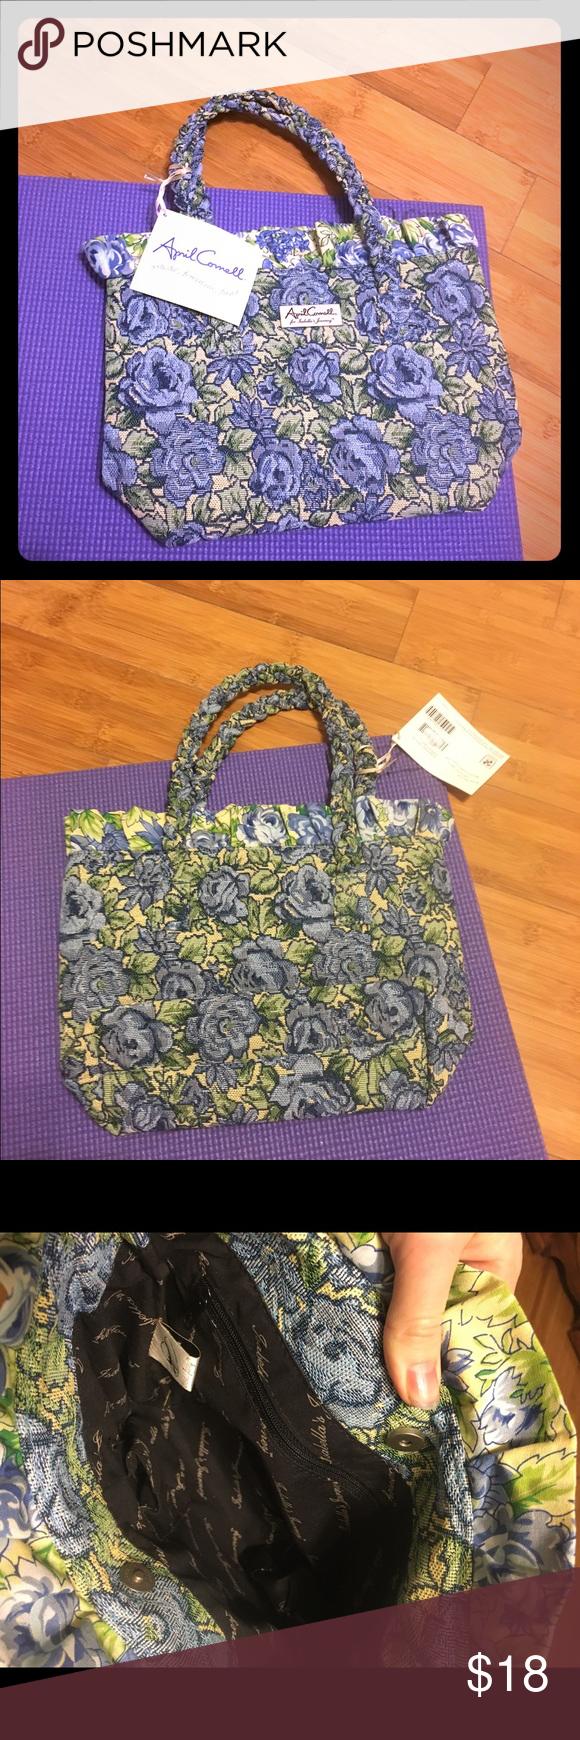 7ba7ee6d33 NWT April Cornell Isabella s Journey carpet bag NWT